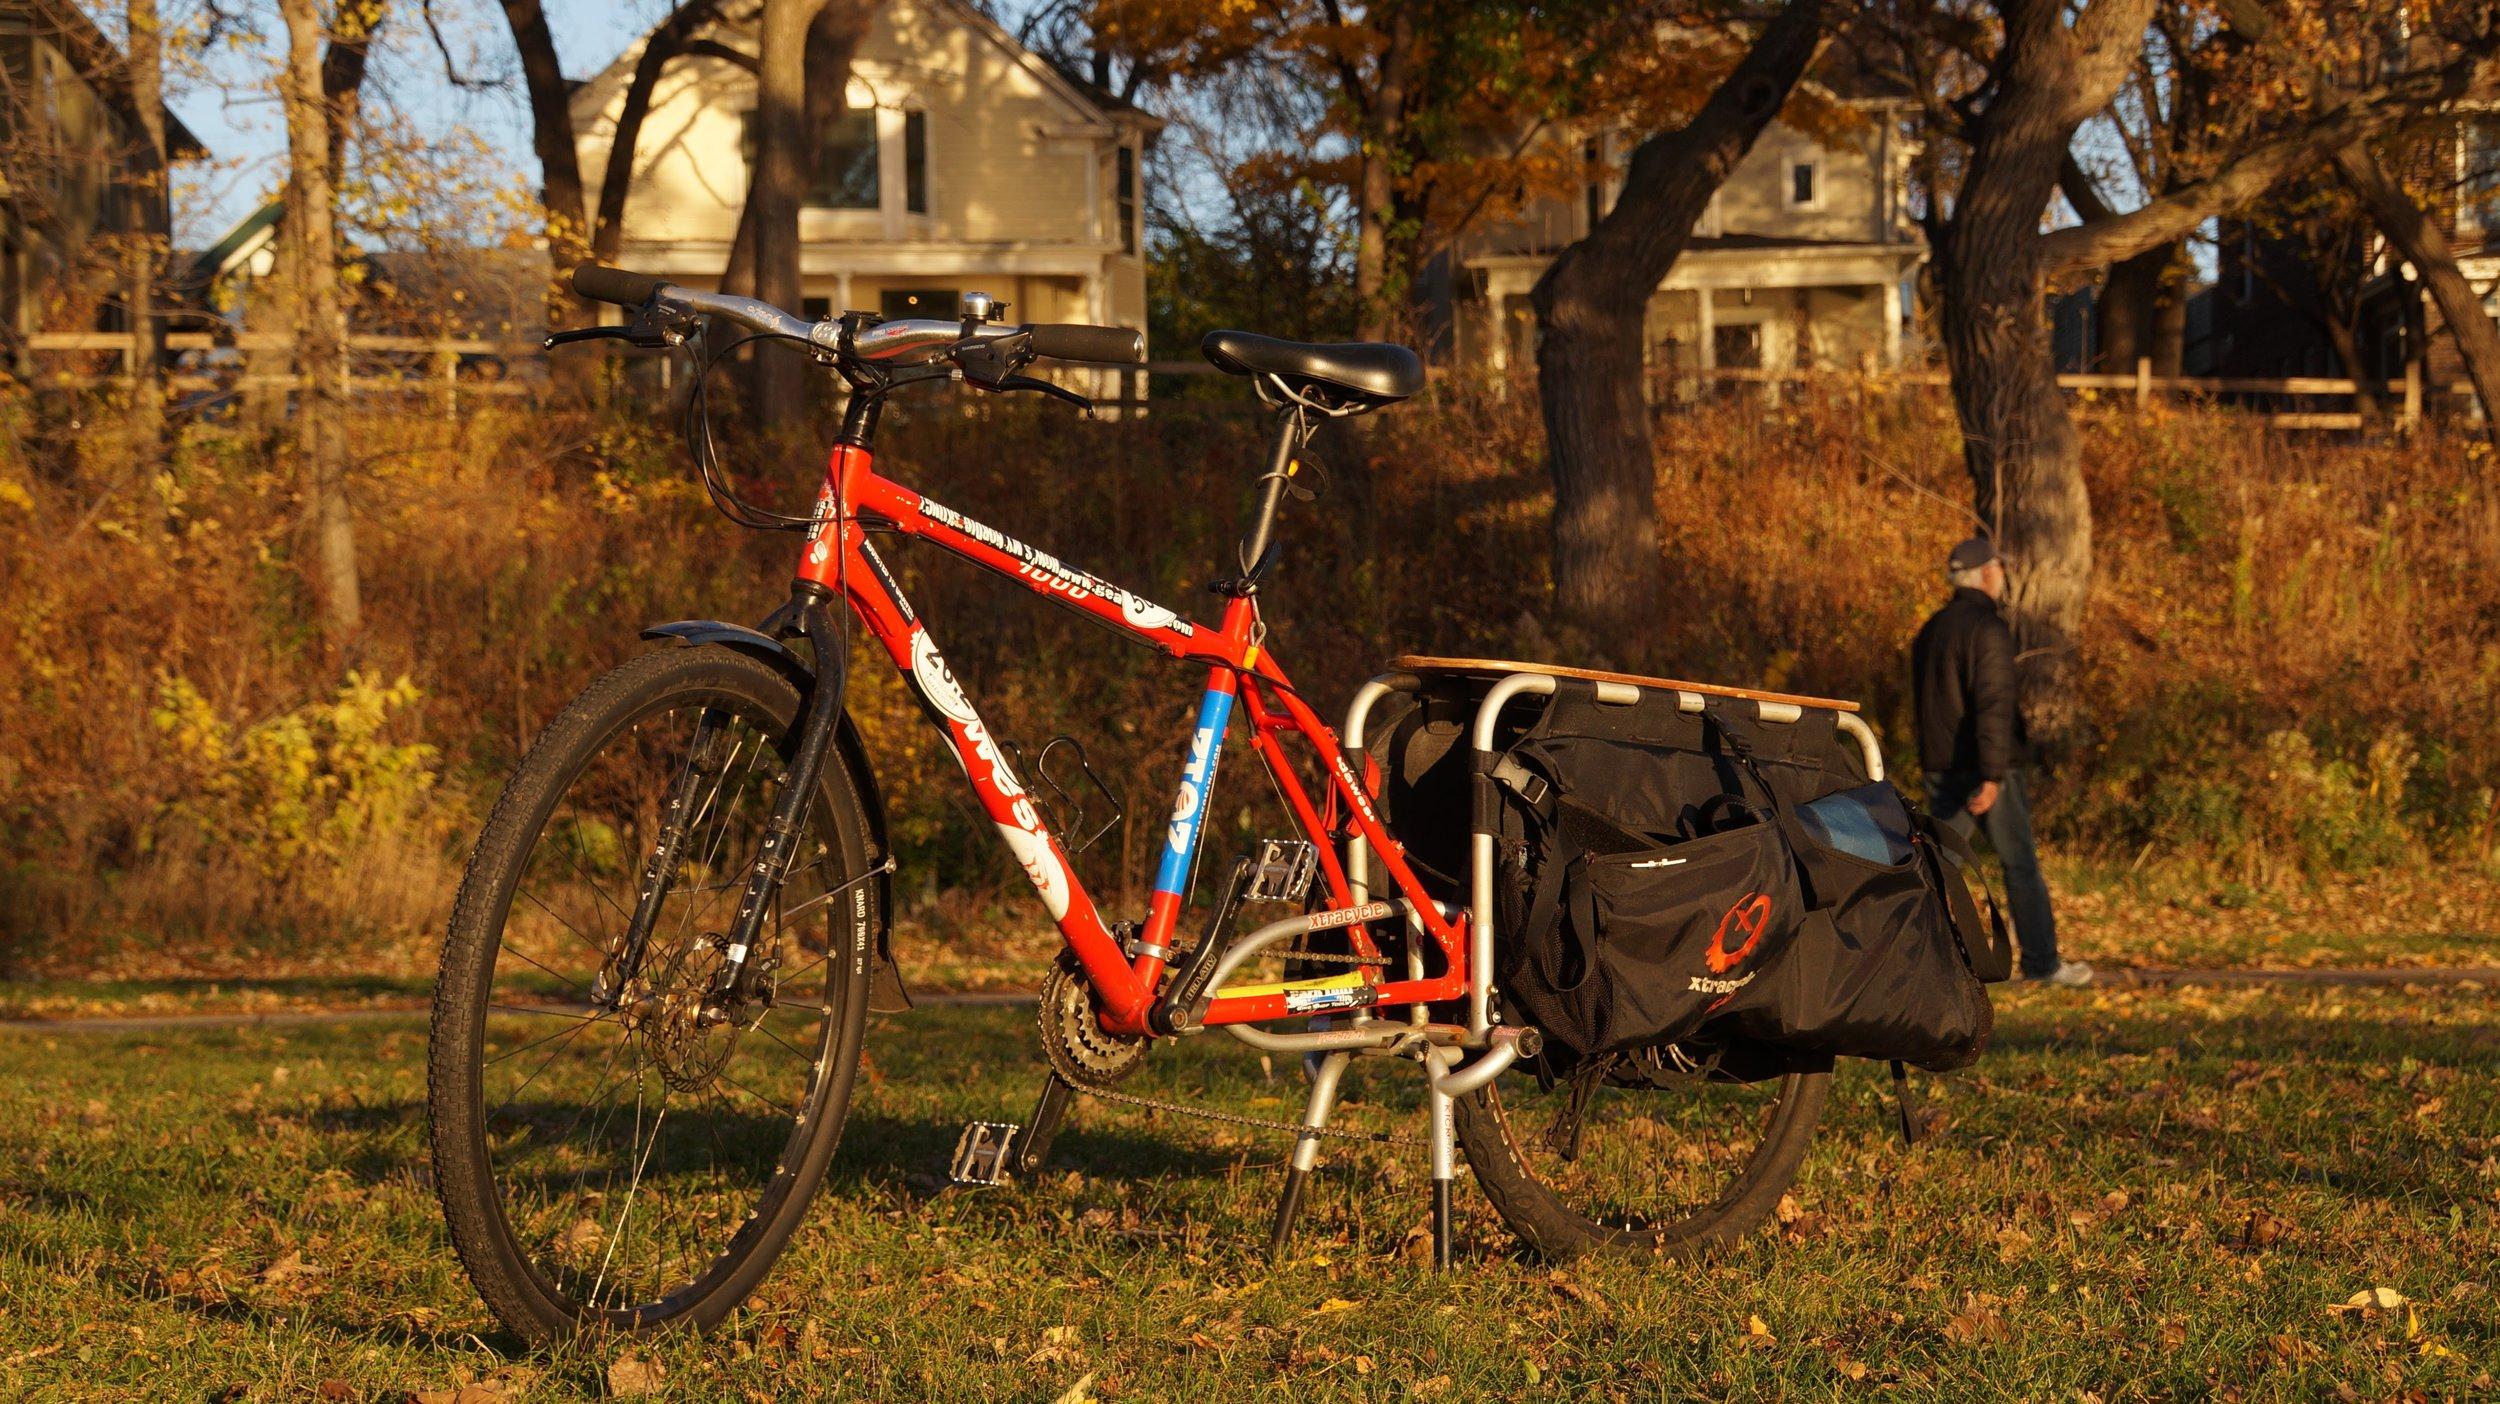 xtra-cycle free radical